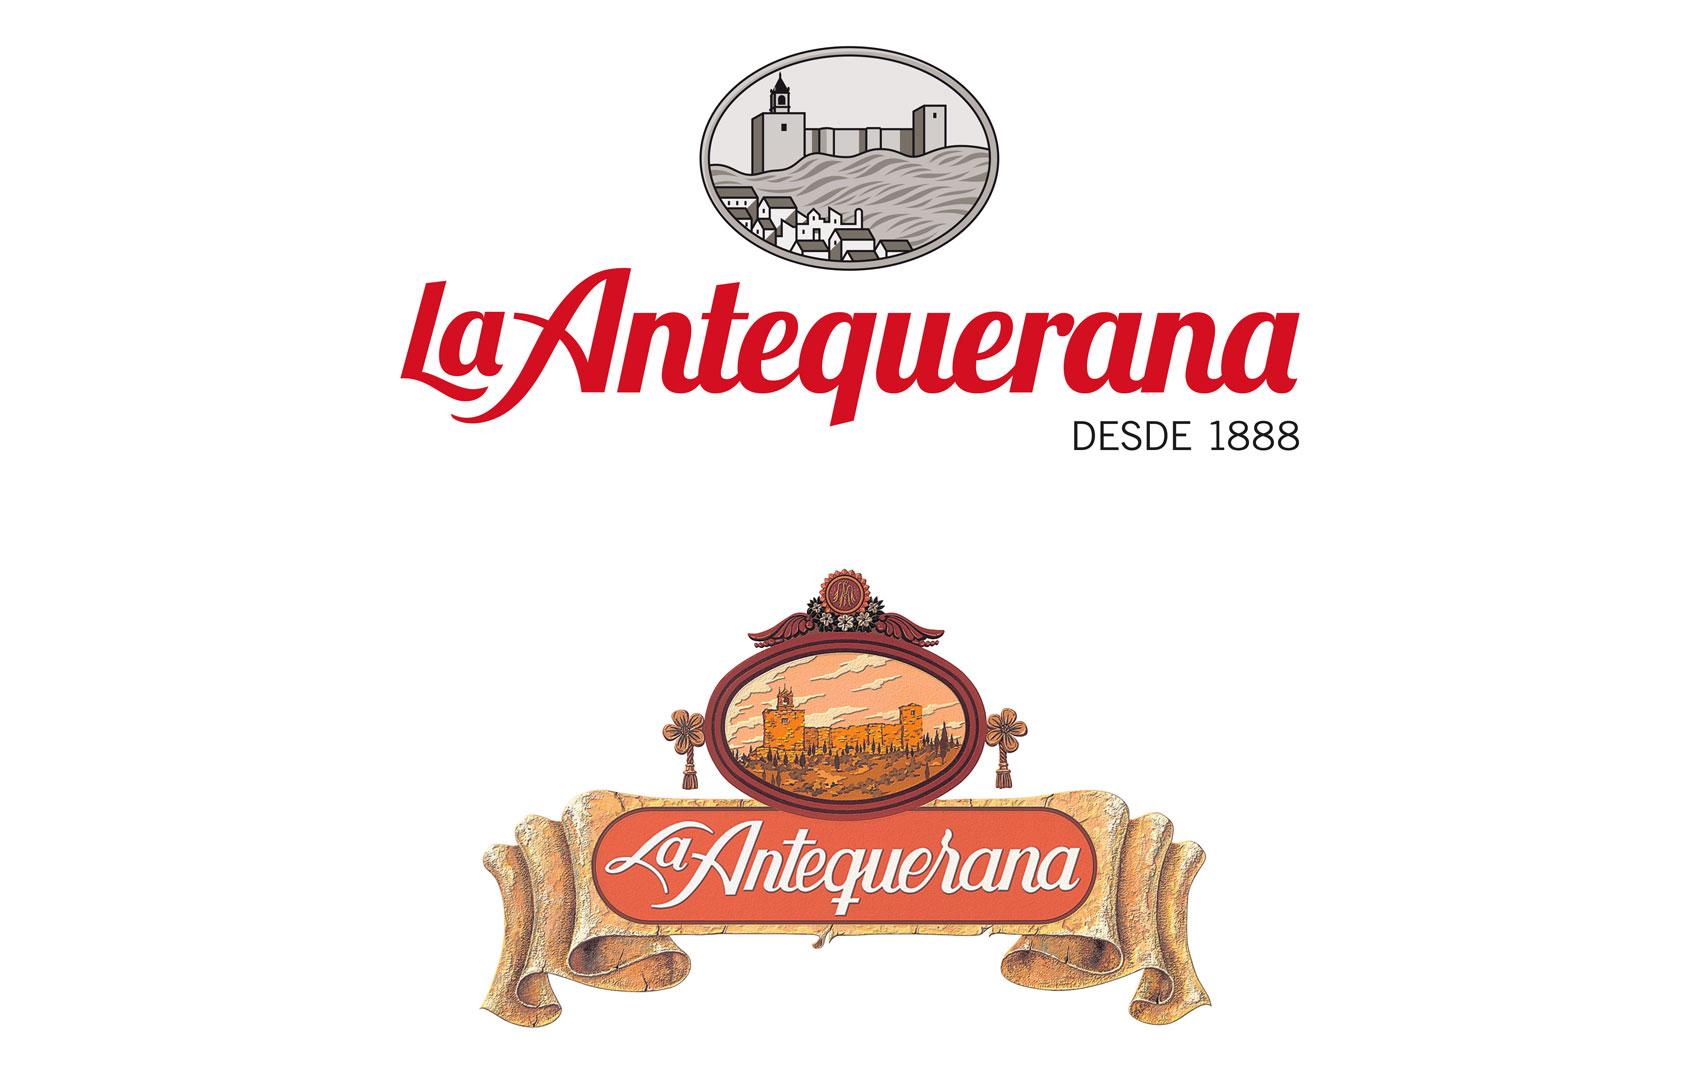 ident-lanatequerana-03.jpg